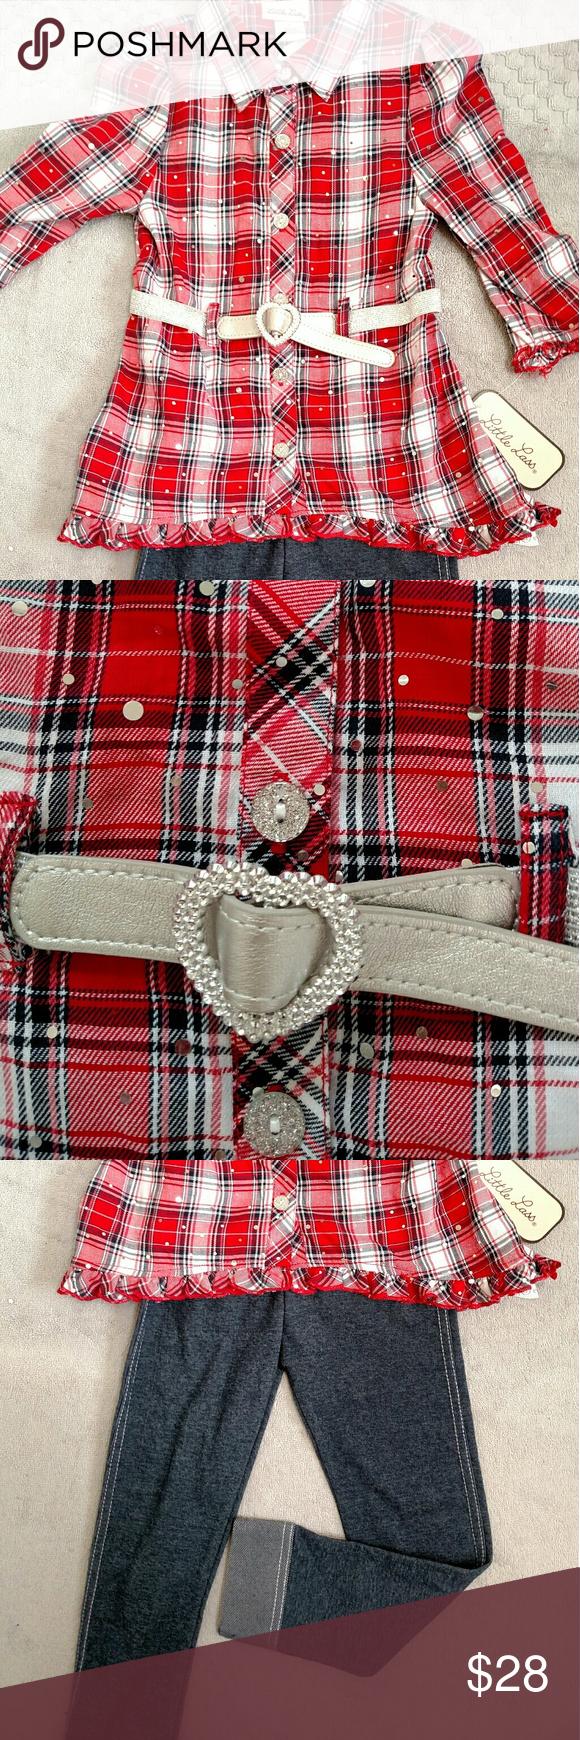 Bondage belt red plaid